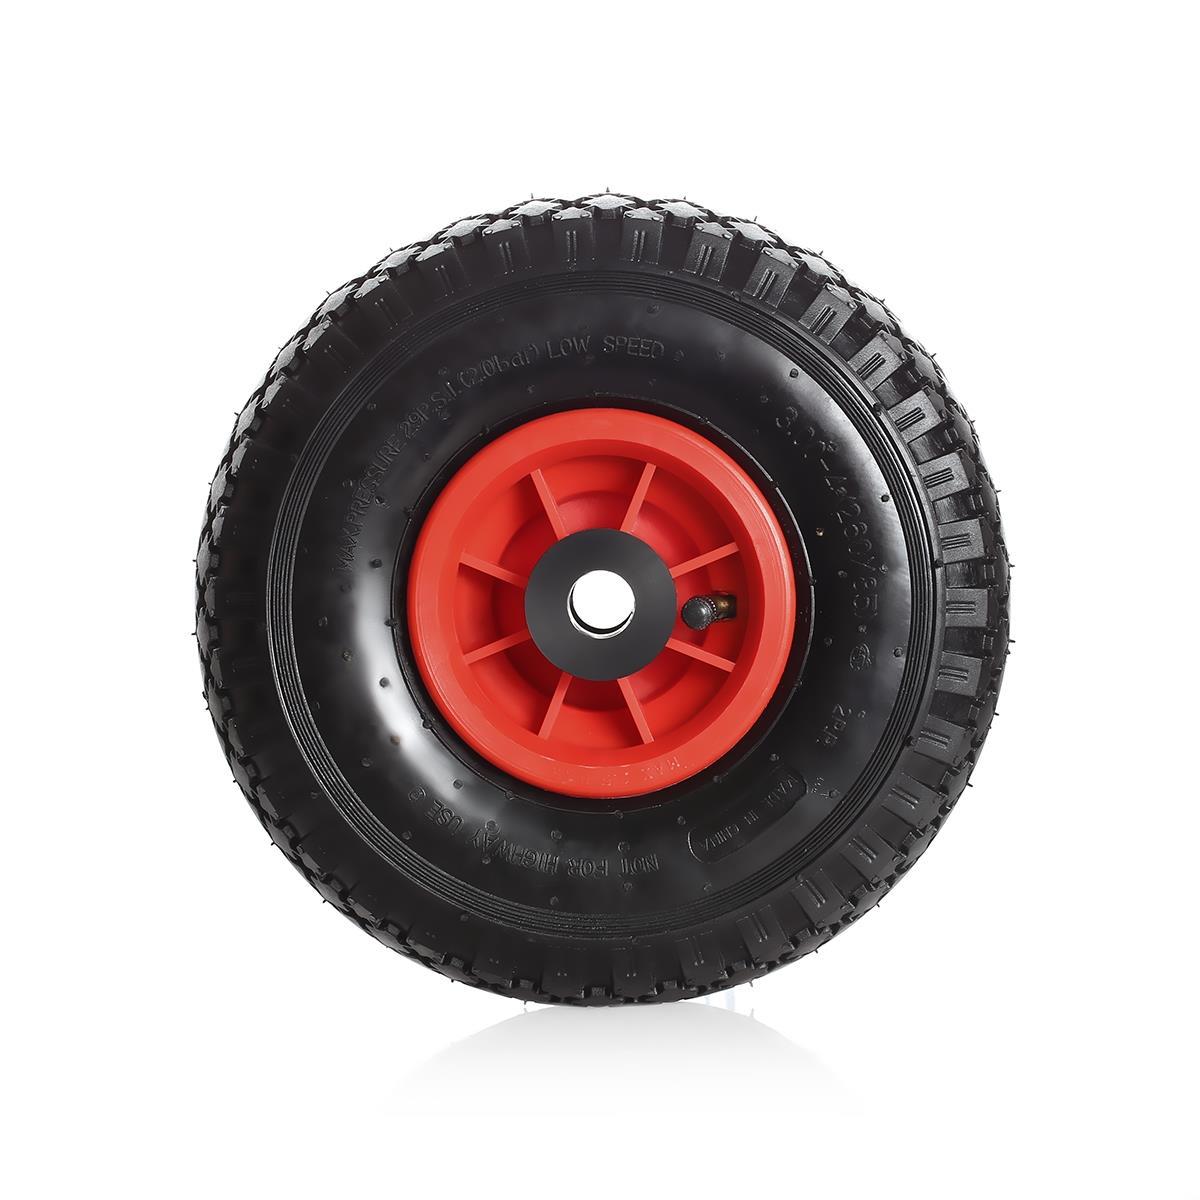 Wheel транцевое For ШЛ-2 Тонар